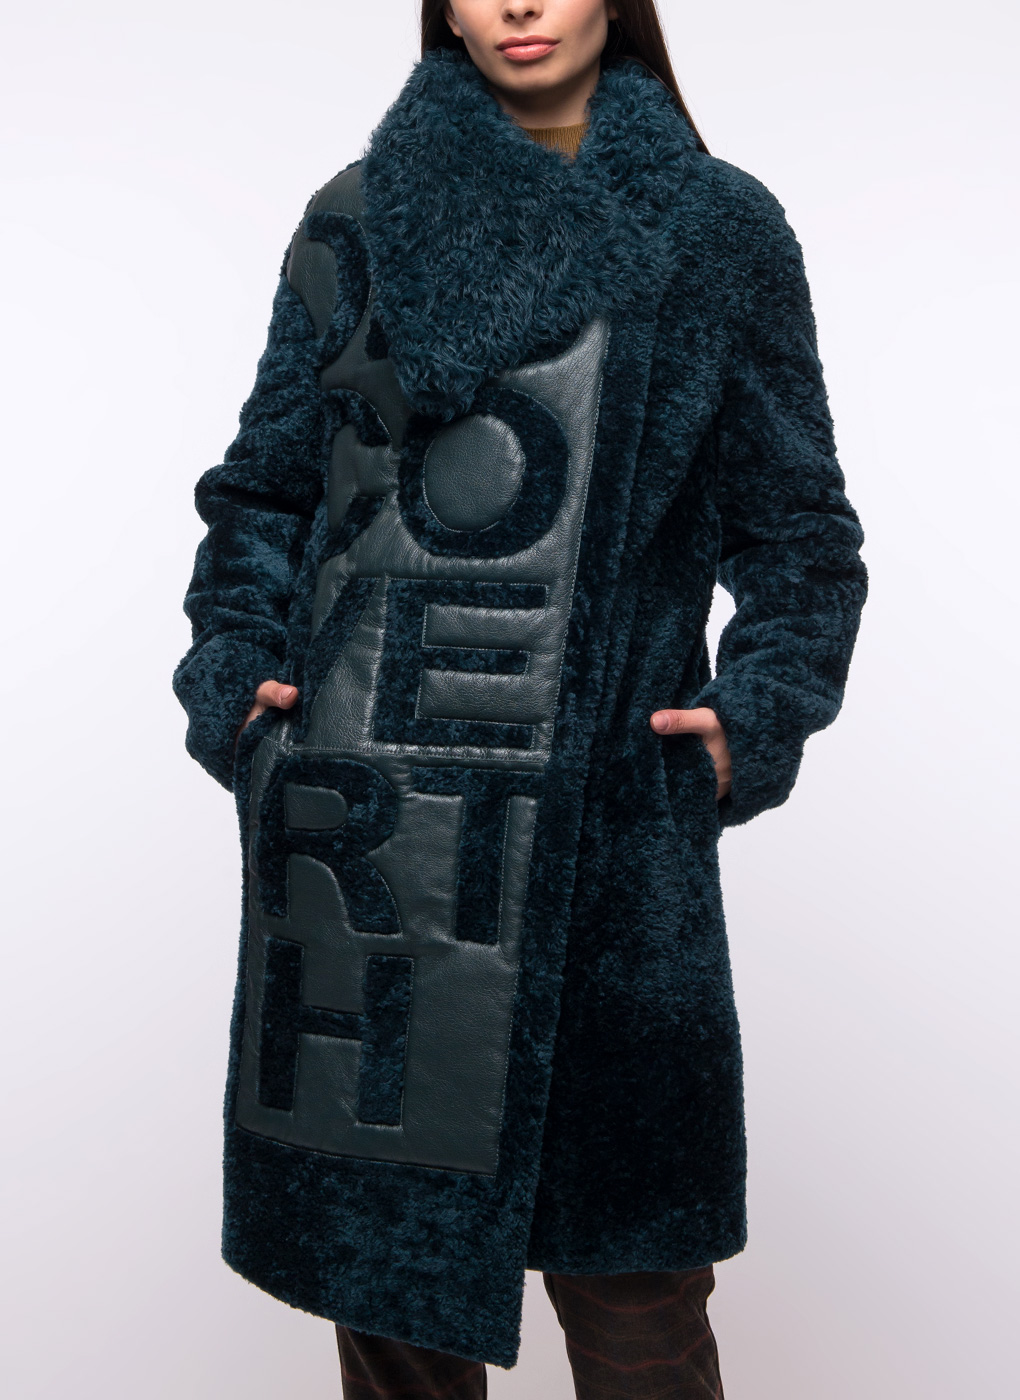 Пальто кокон из овчины 10, Aliance fur фото